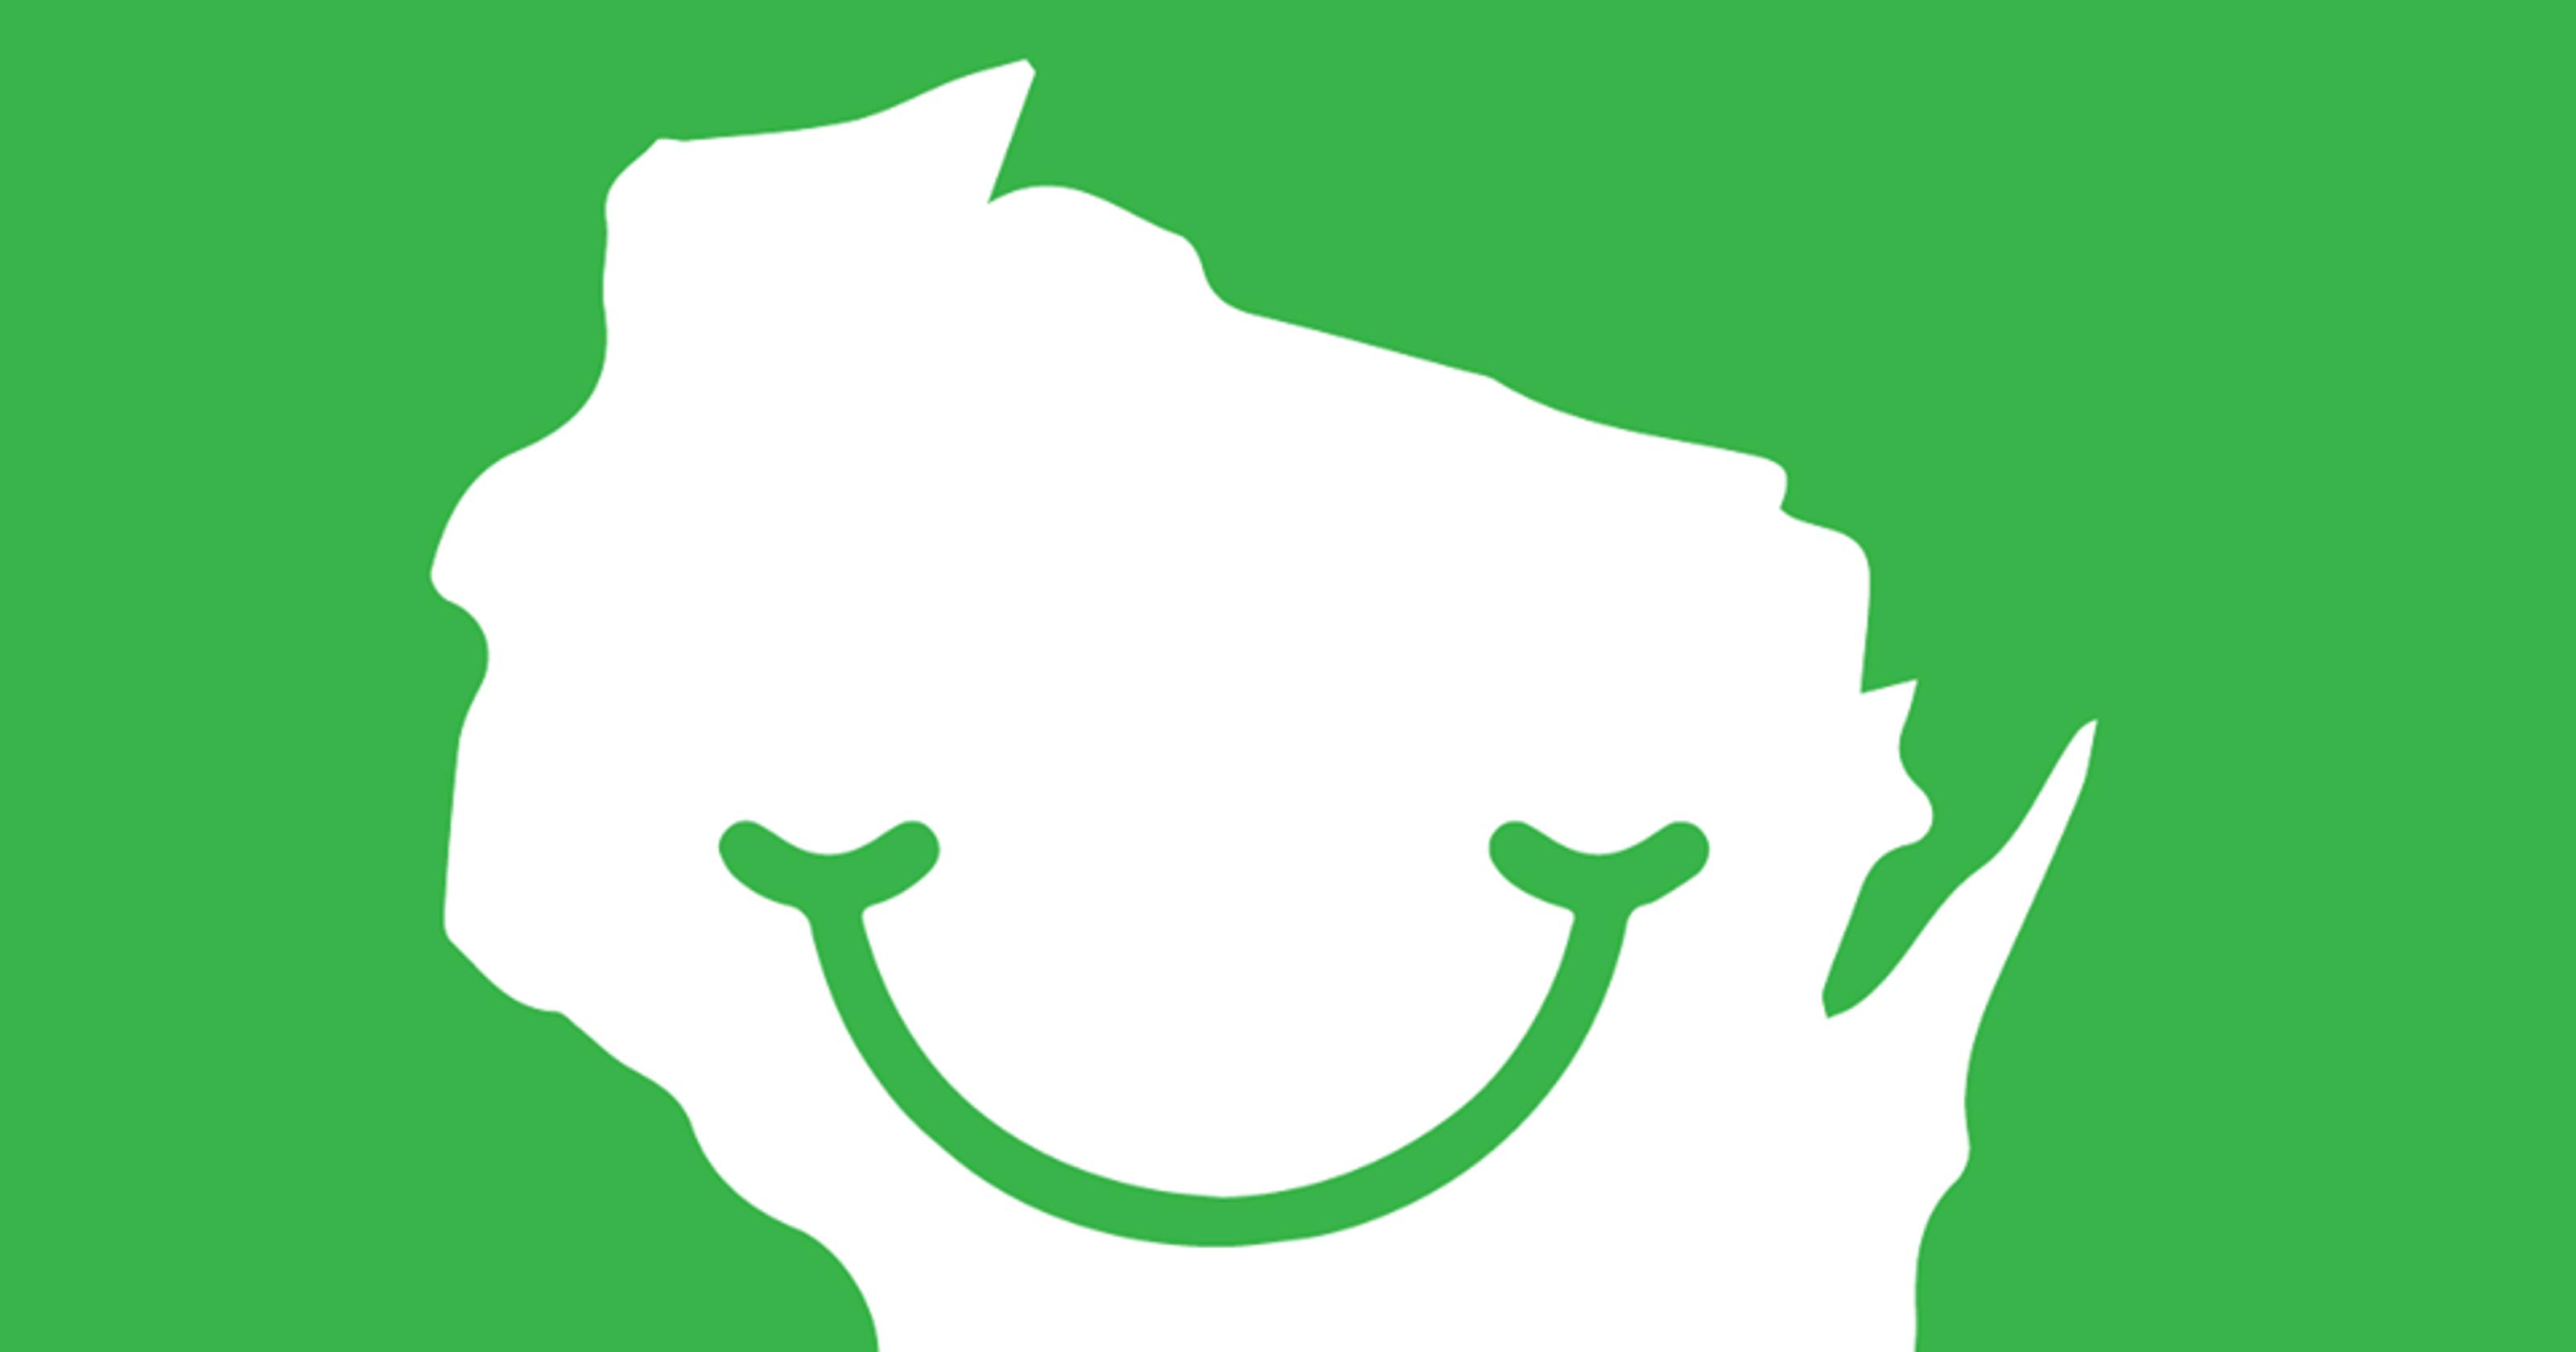 Delta dental logo clipart picture free Delta Dental announces staff changes picture free